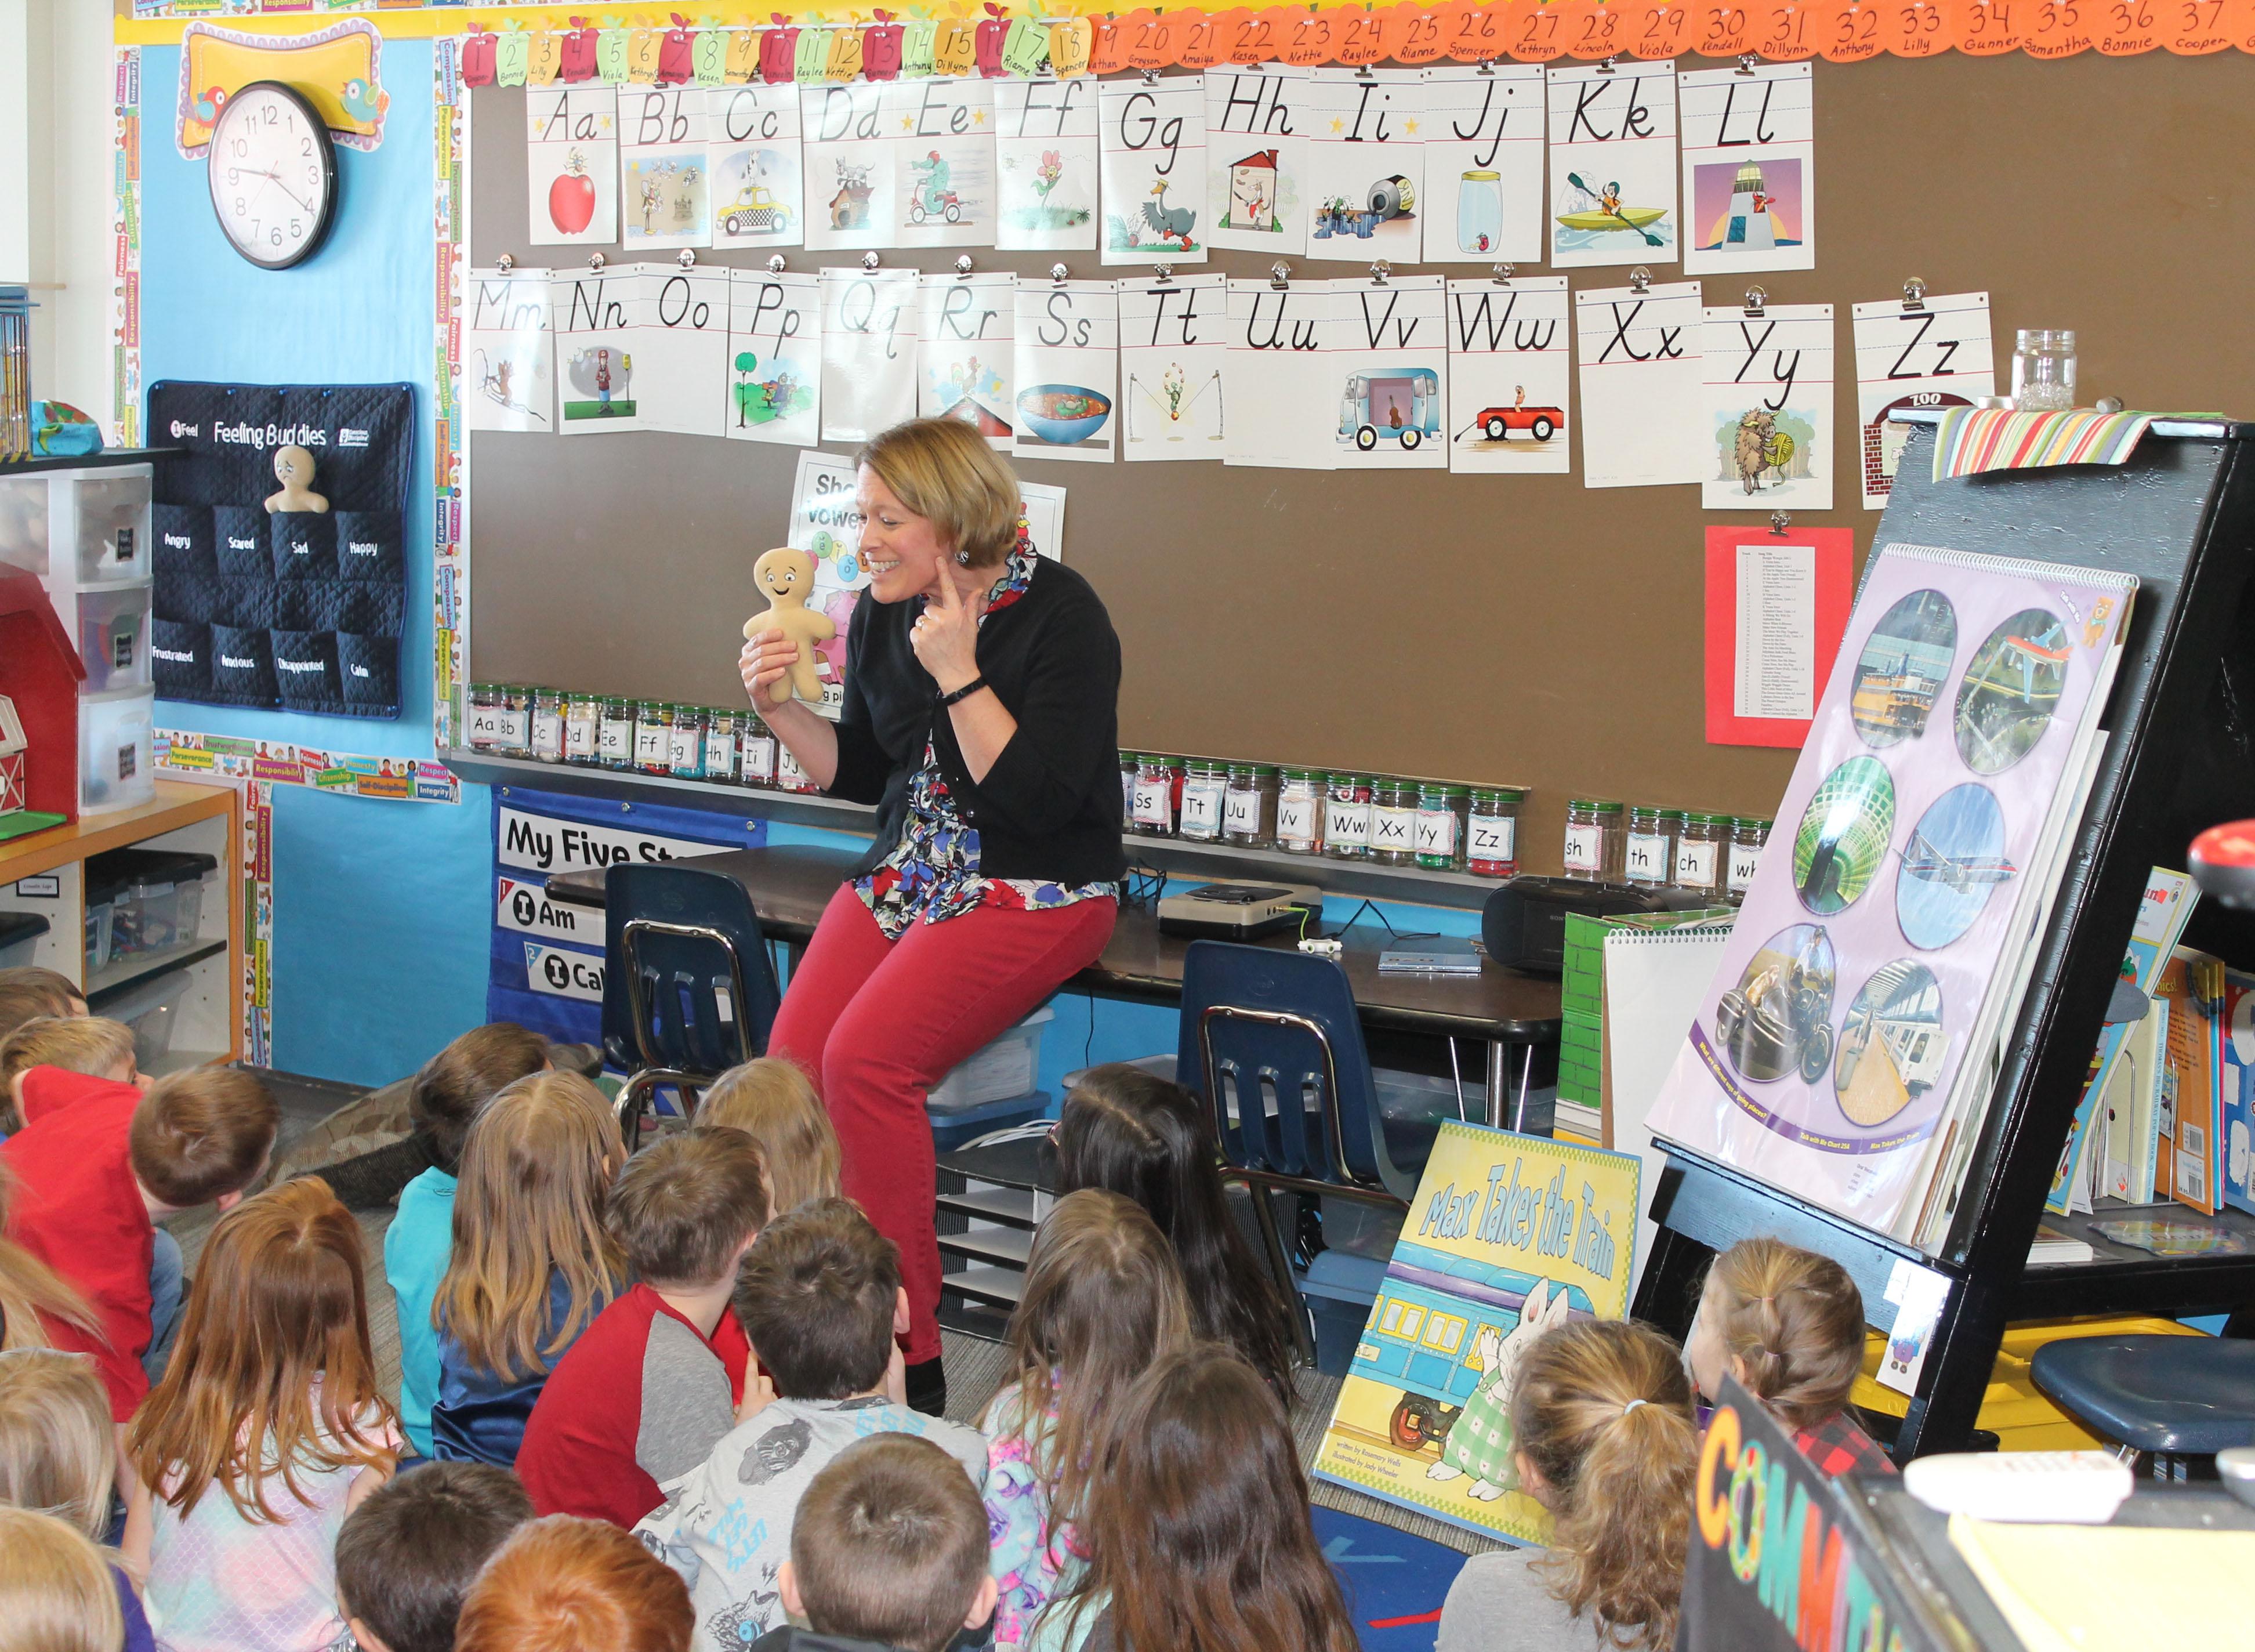 A photo of a teacher in a classroom.